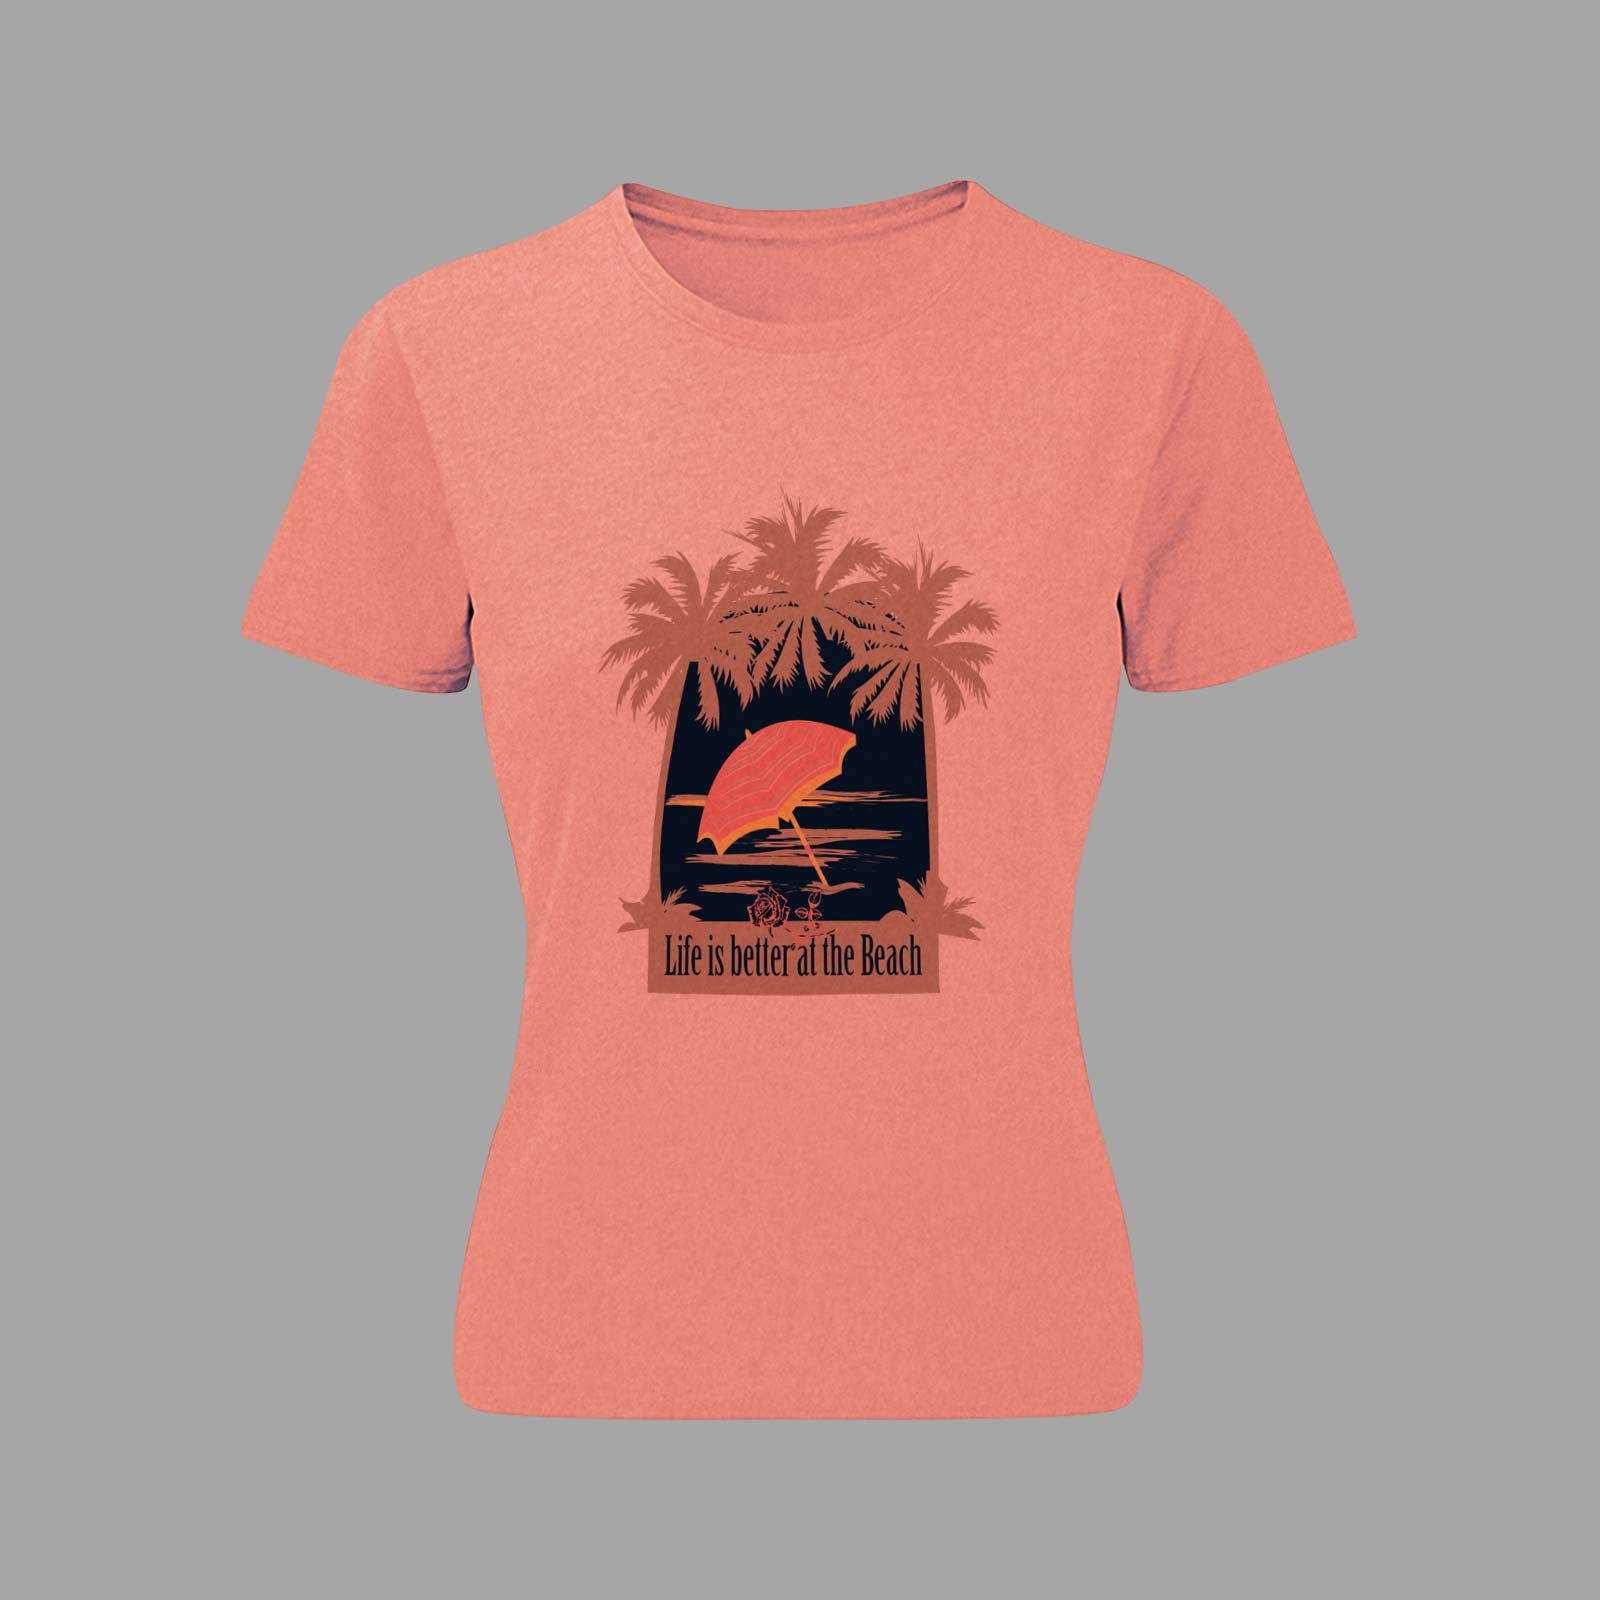 Heart design t shirt - Tirita Seaside Sailor Anchor Beach Love Heart Design